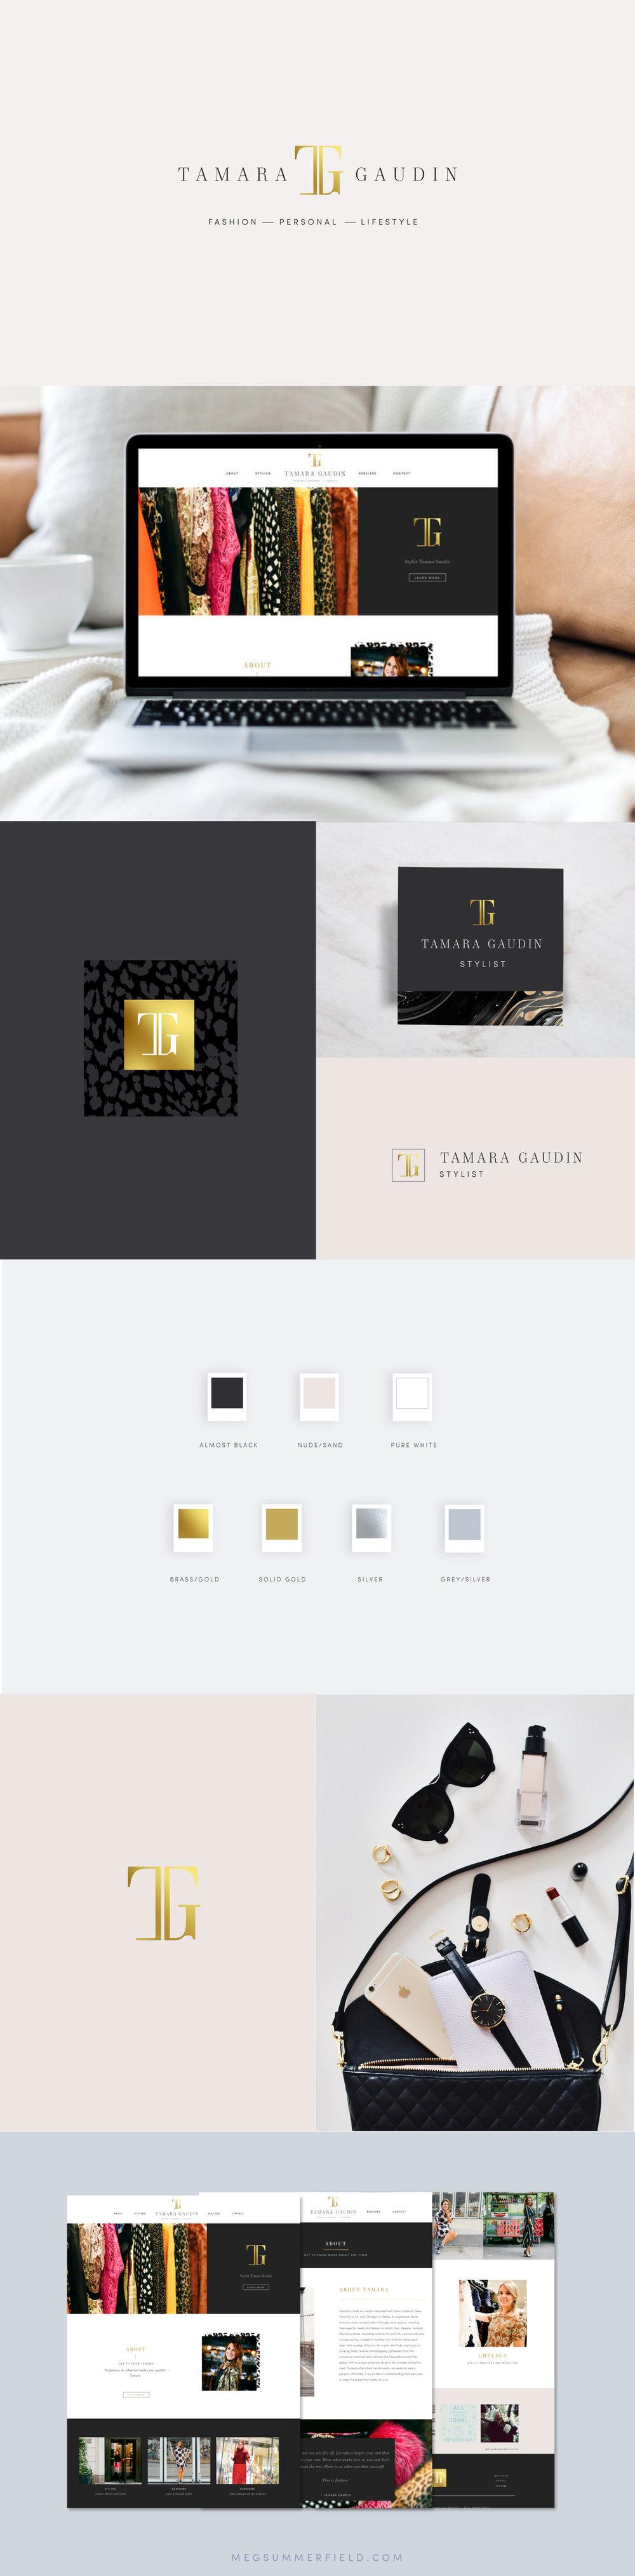 Squarespace Site for Fashion Stylist